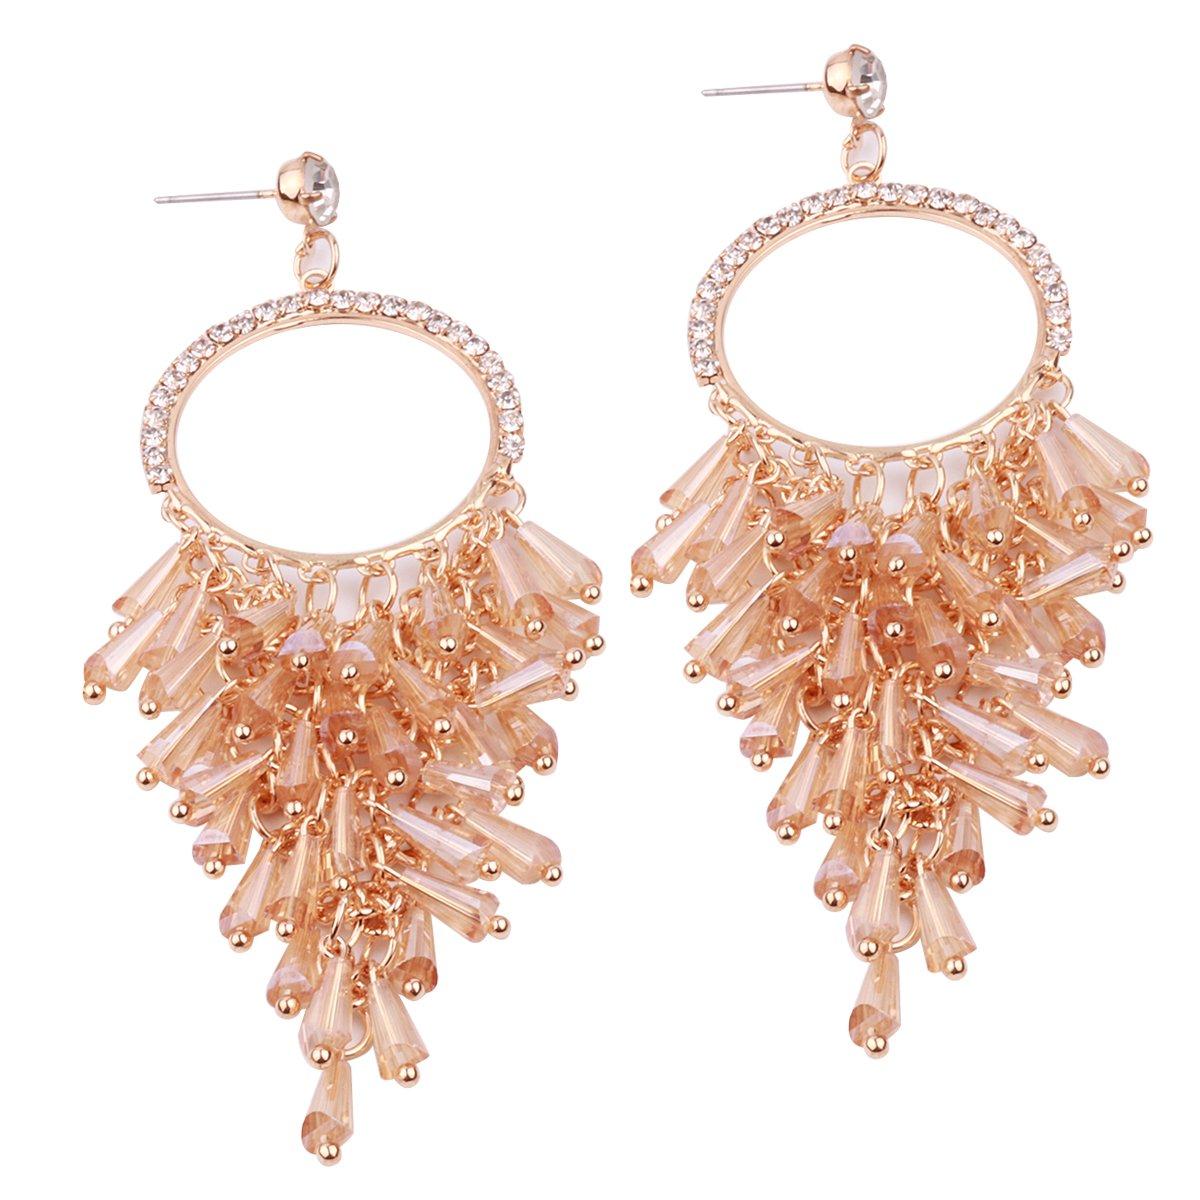 Women`s Bohemian Classical Tassel Drop Earrings Statement Earrings Beaded Earrings, Gift for Her (Light Brown)